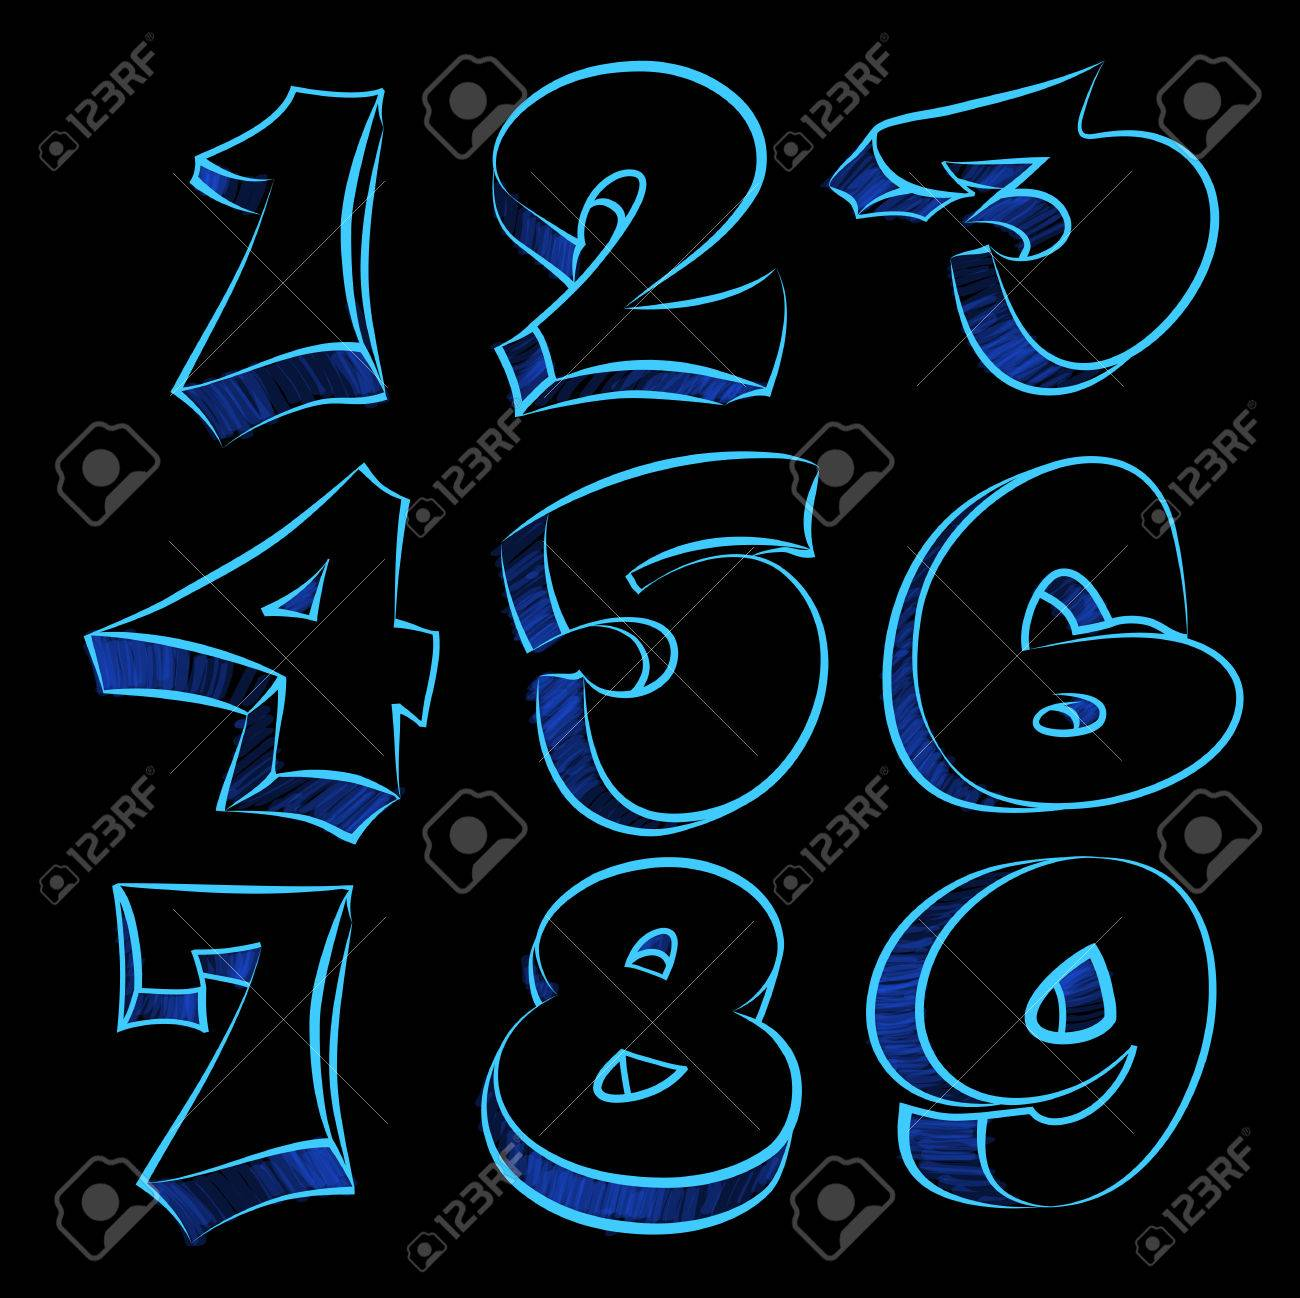 Blue graffiti figures modern type grafitti design stock vector 50476432